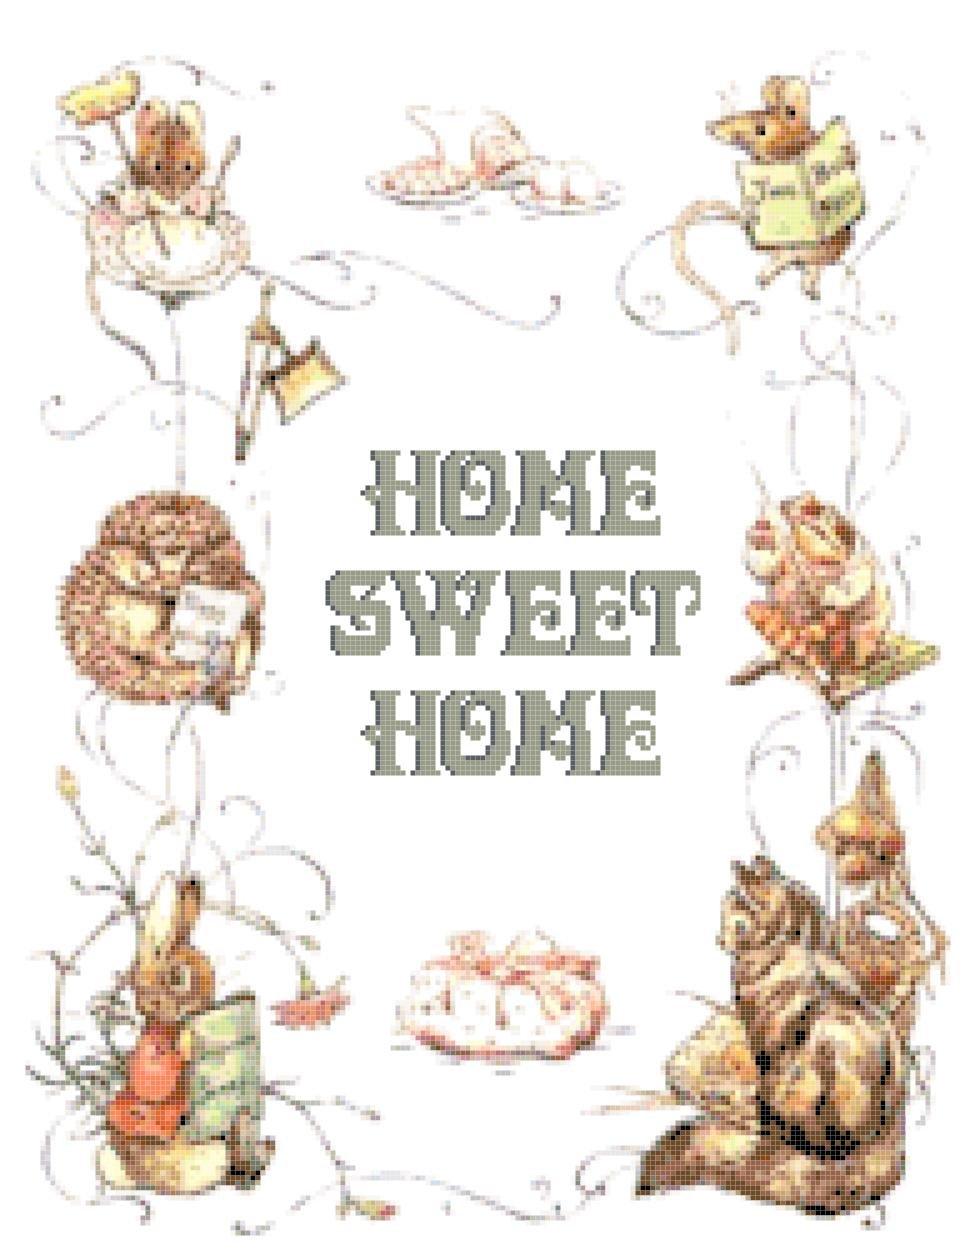 counted cross stitch pattern Home sweet home potter pdf 185x237 stitches E1155